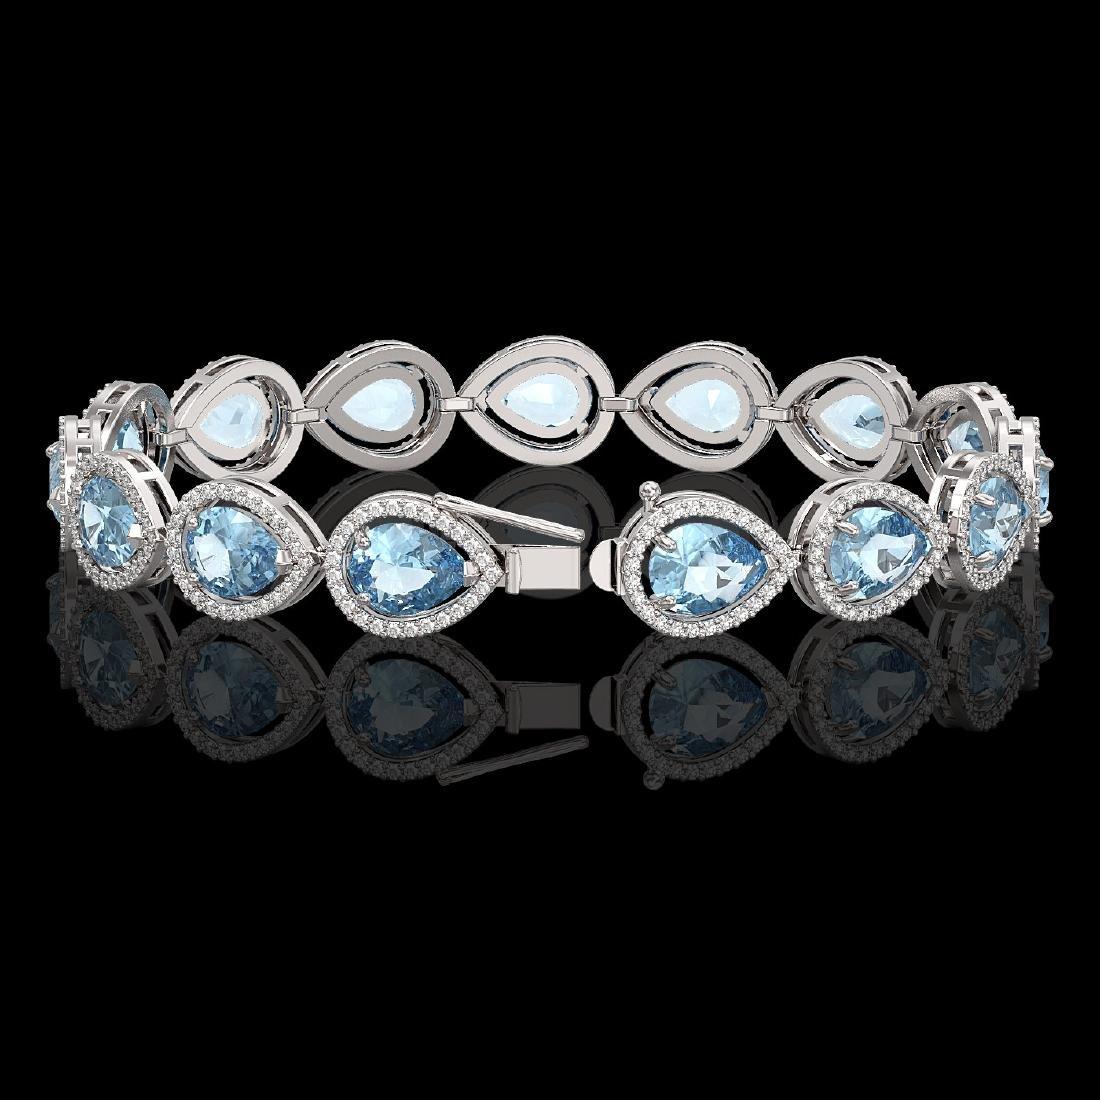 19.85 CTW Aquamarine & Diamond Halo Bracelet 10K White - 2